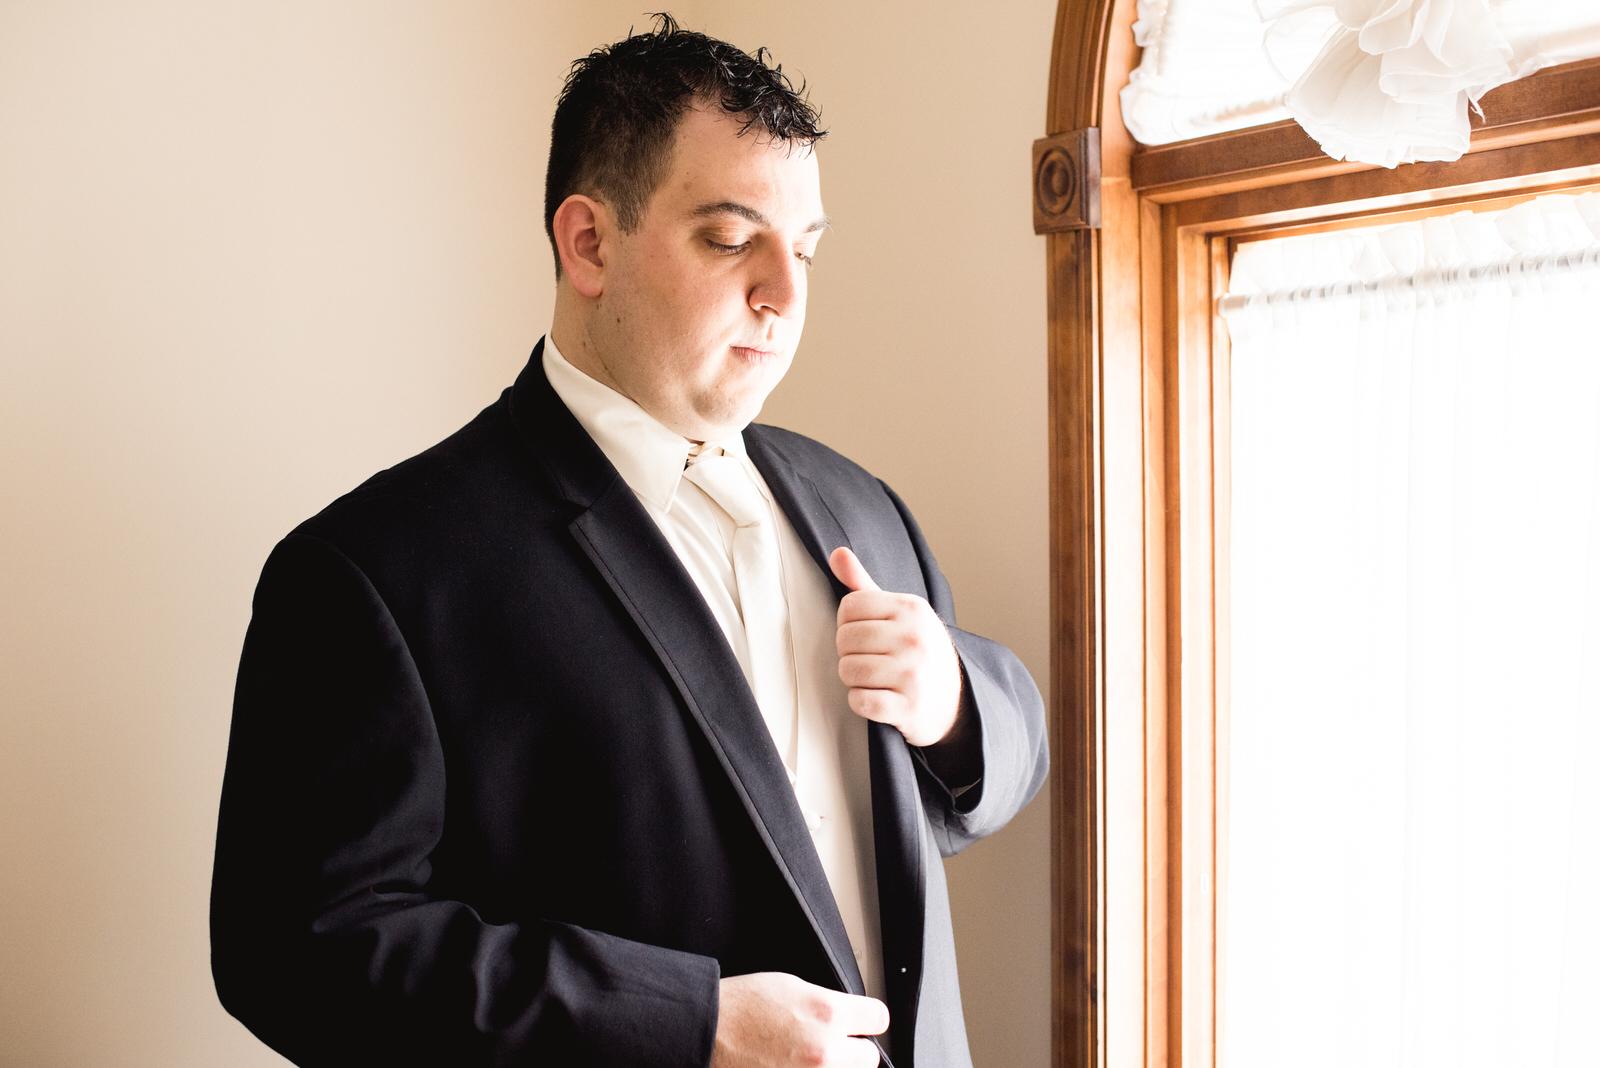 Laube_Banquet_Hall__Wedding_Photos_002.jpg